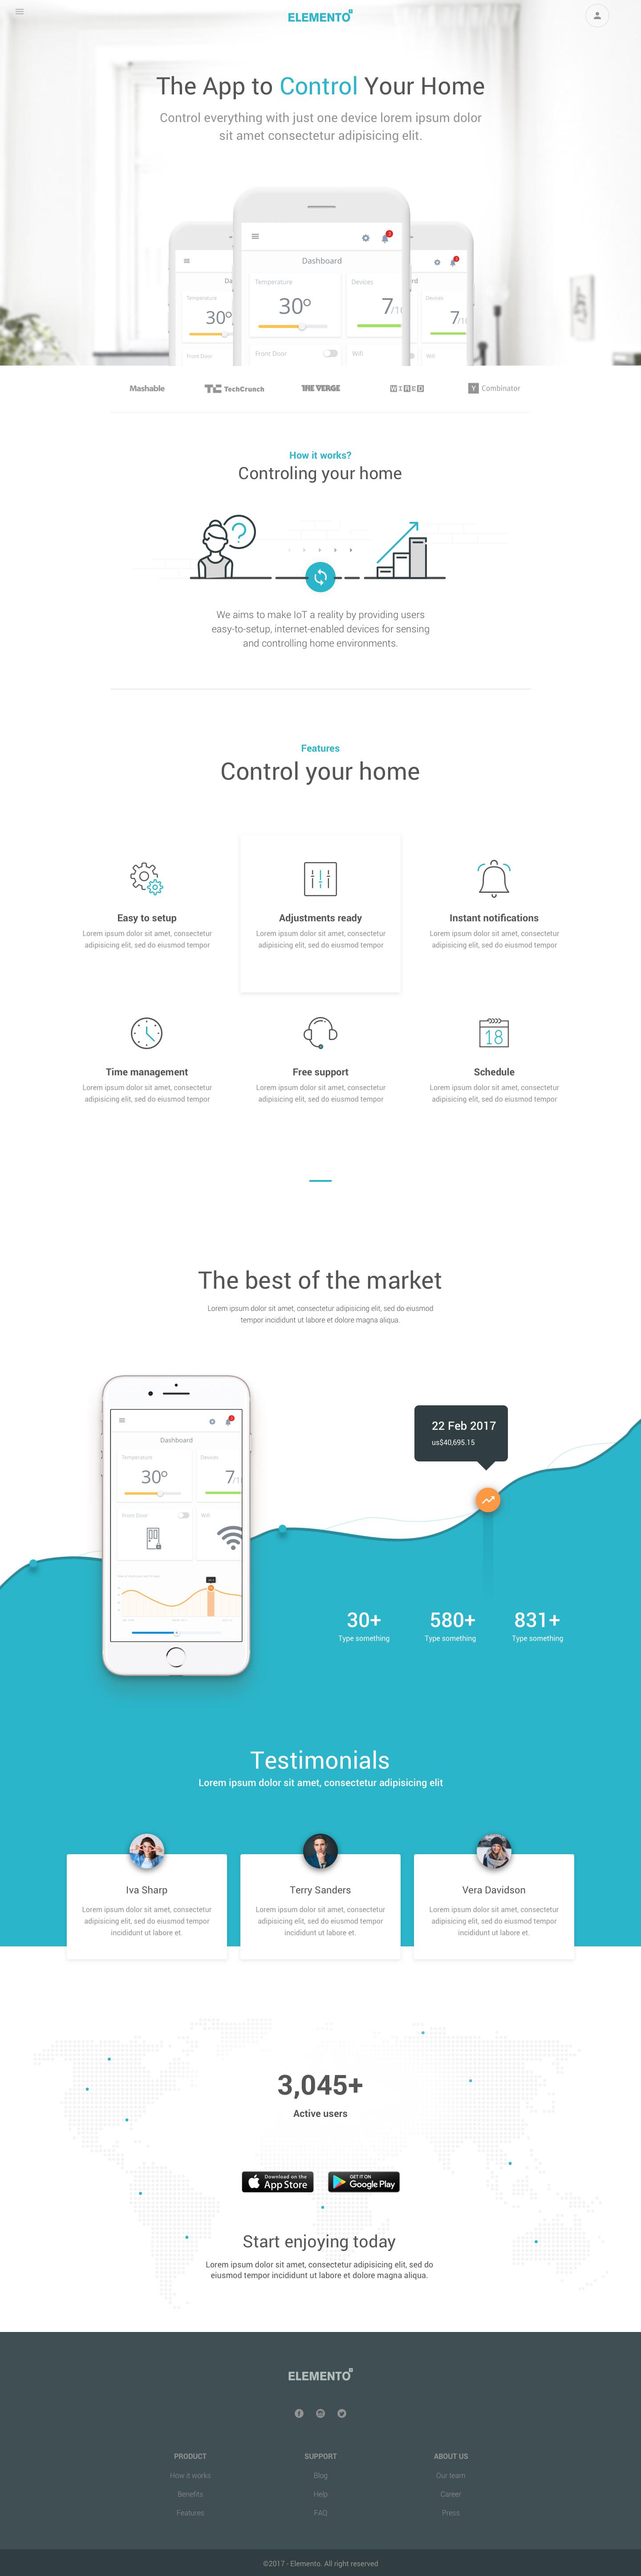 elemento - multi-purpose template for startups - sketch template, Presentation templates